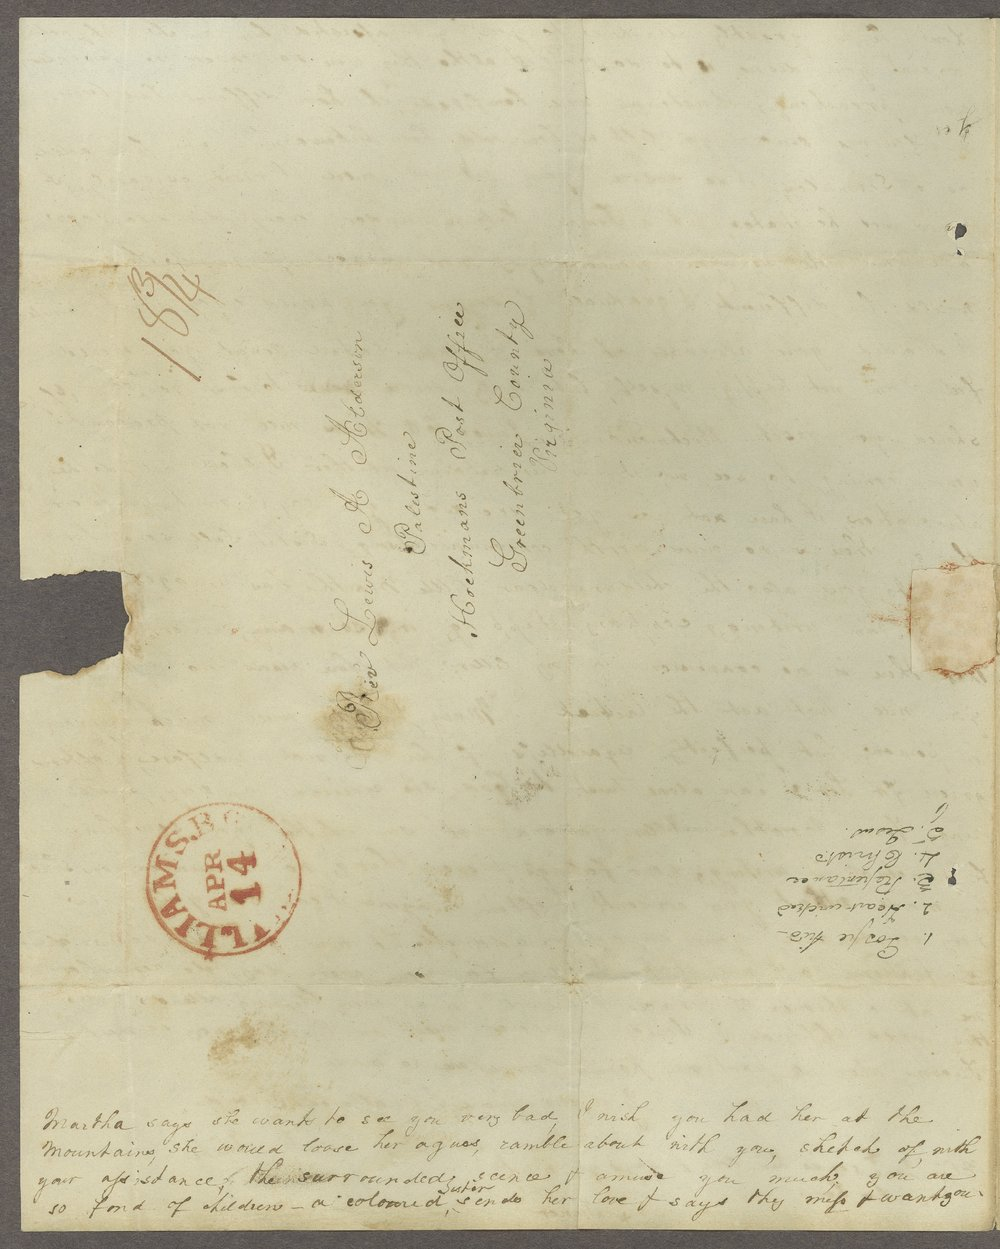 Louisa E. White to Lewis Allen Alderson - 4